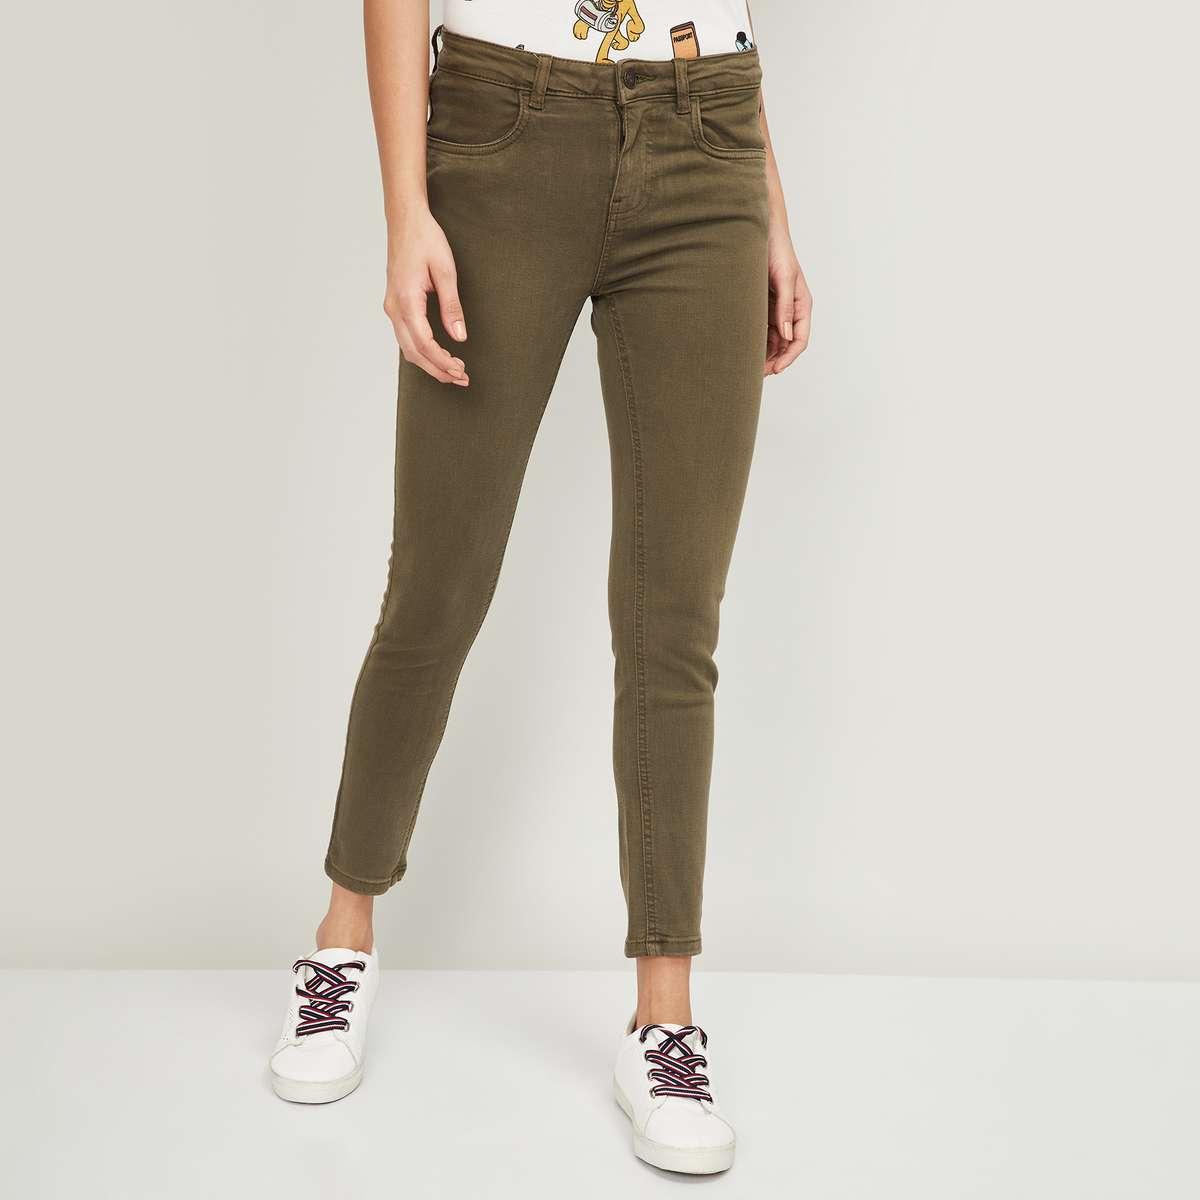 4.FAME FOREVER Women Solid Slim Fit Jeans